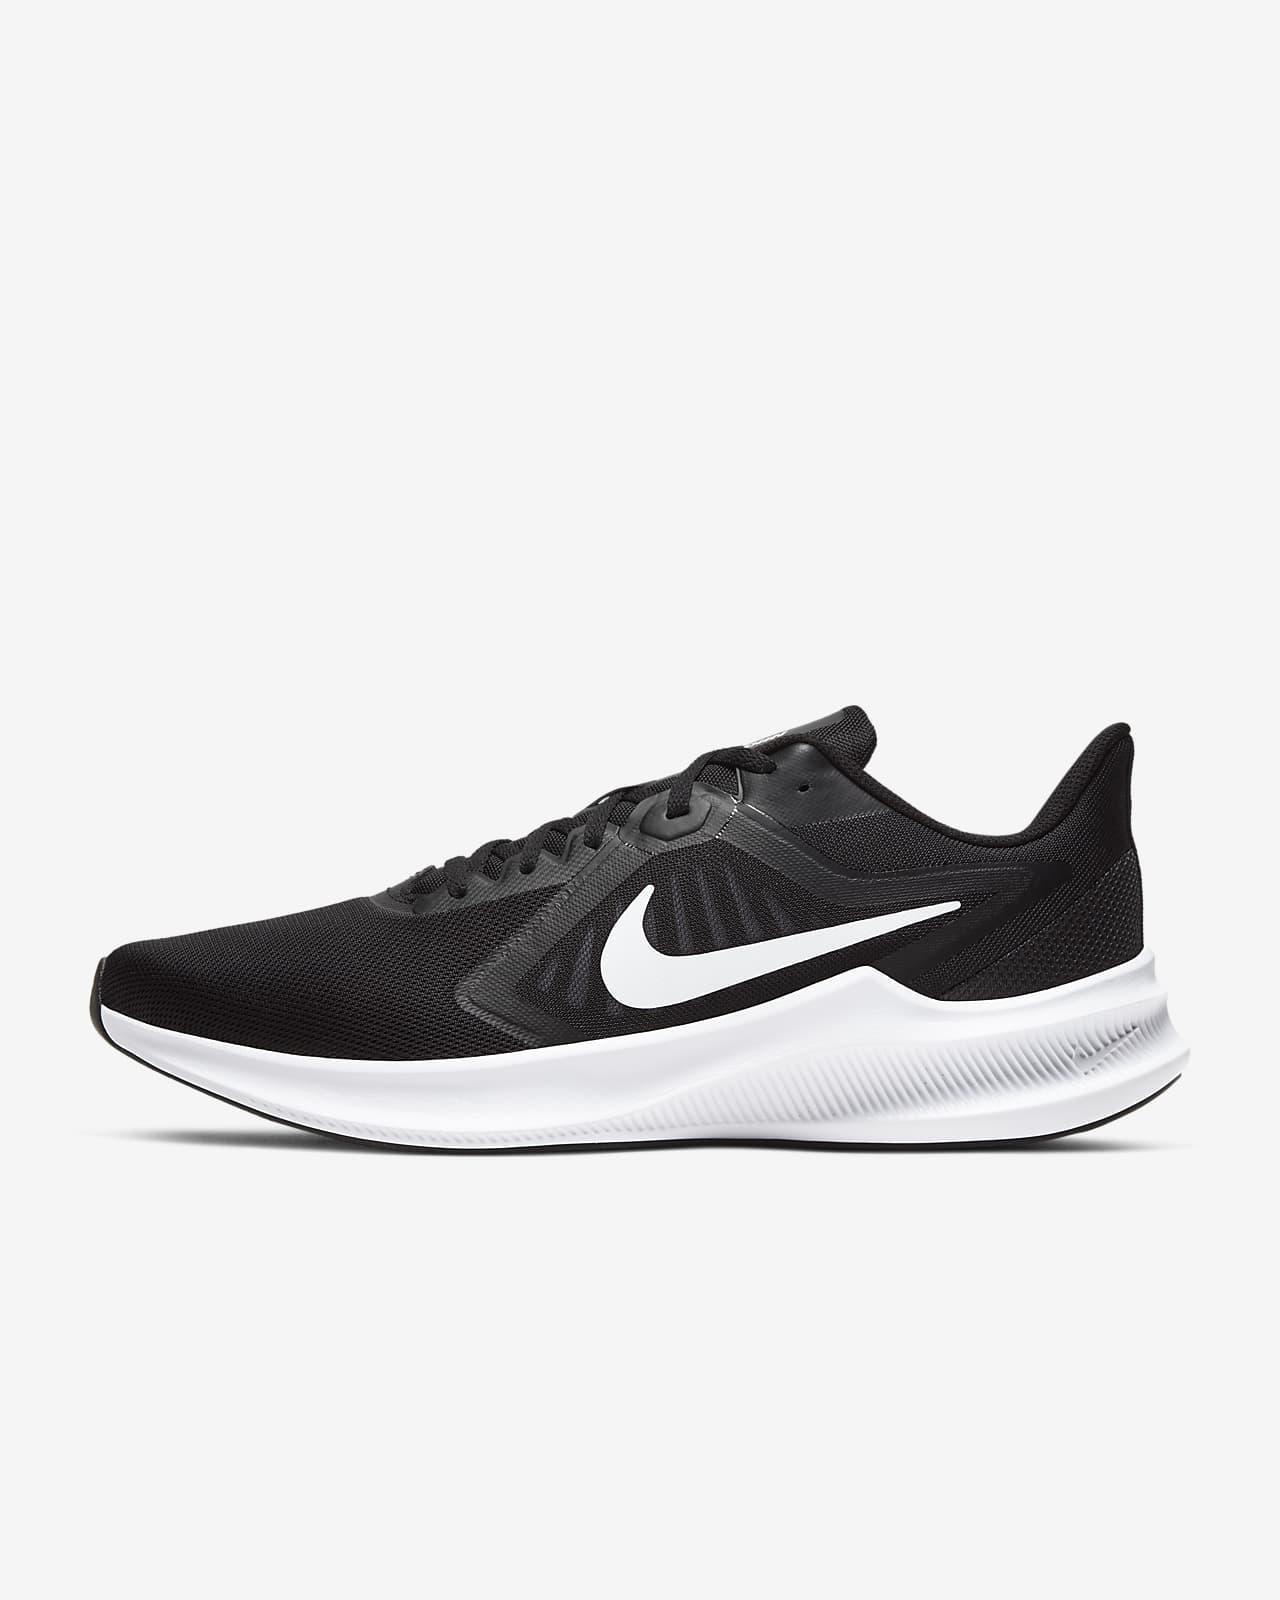 Nike Downshifter 10 Men's Road Running Shoes